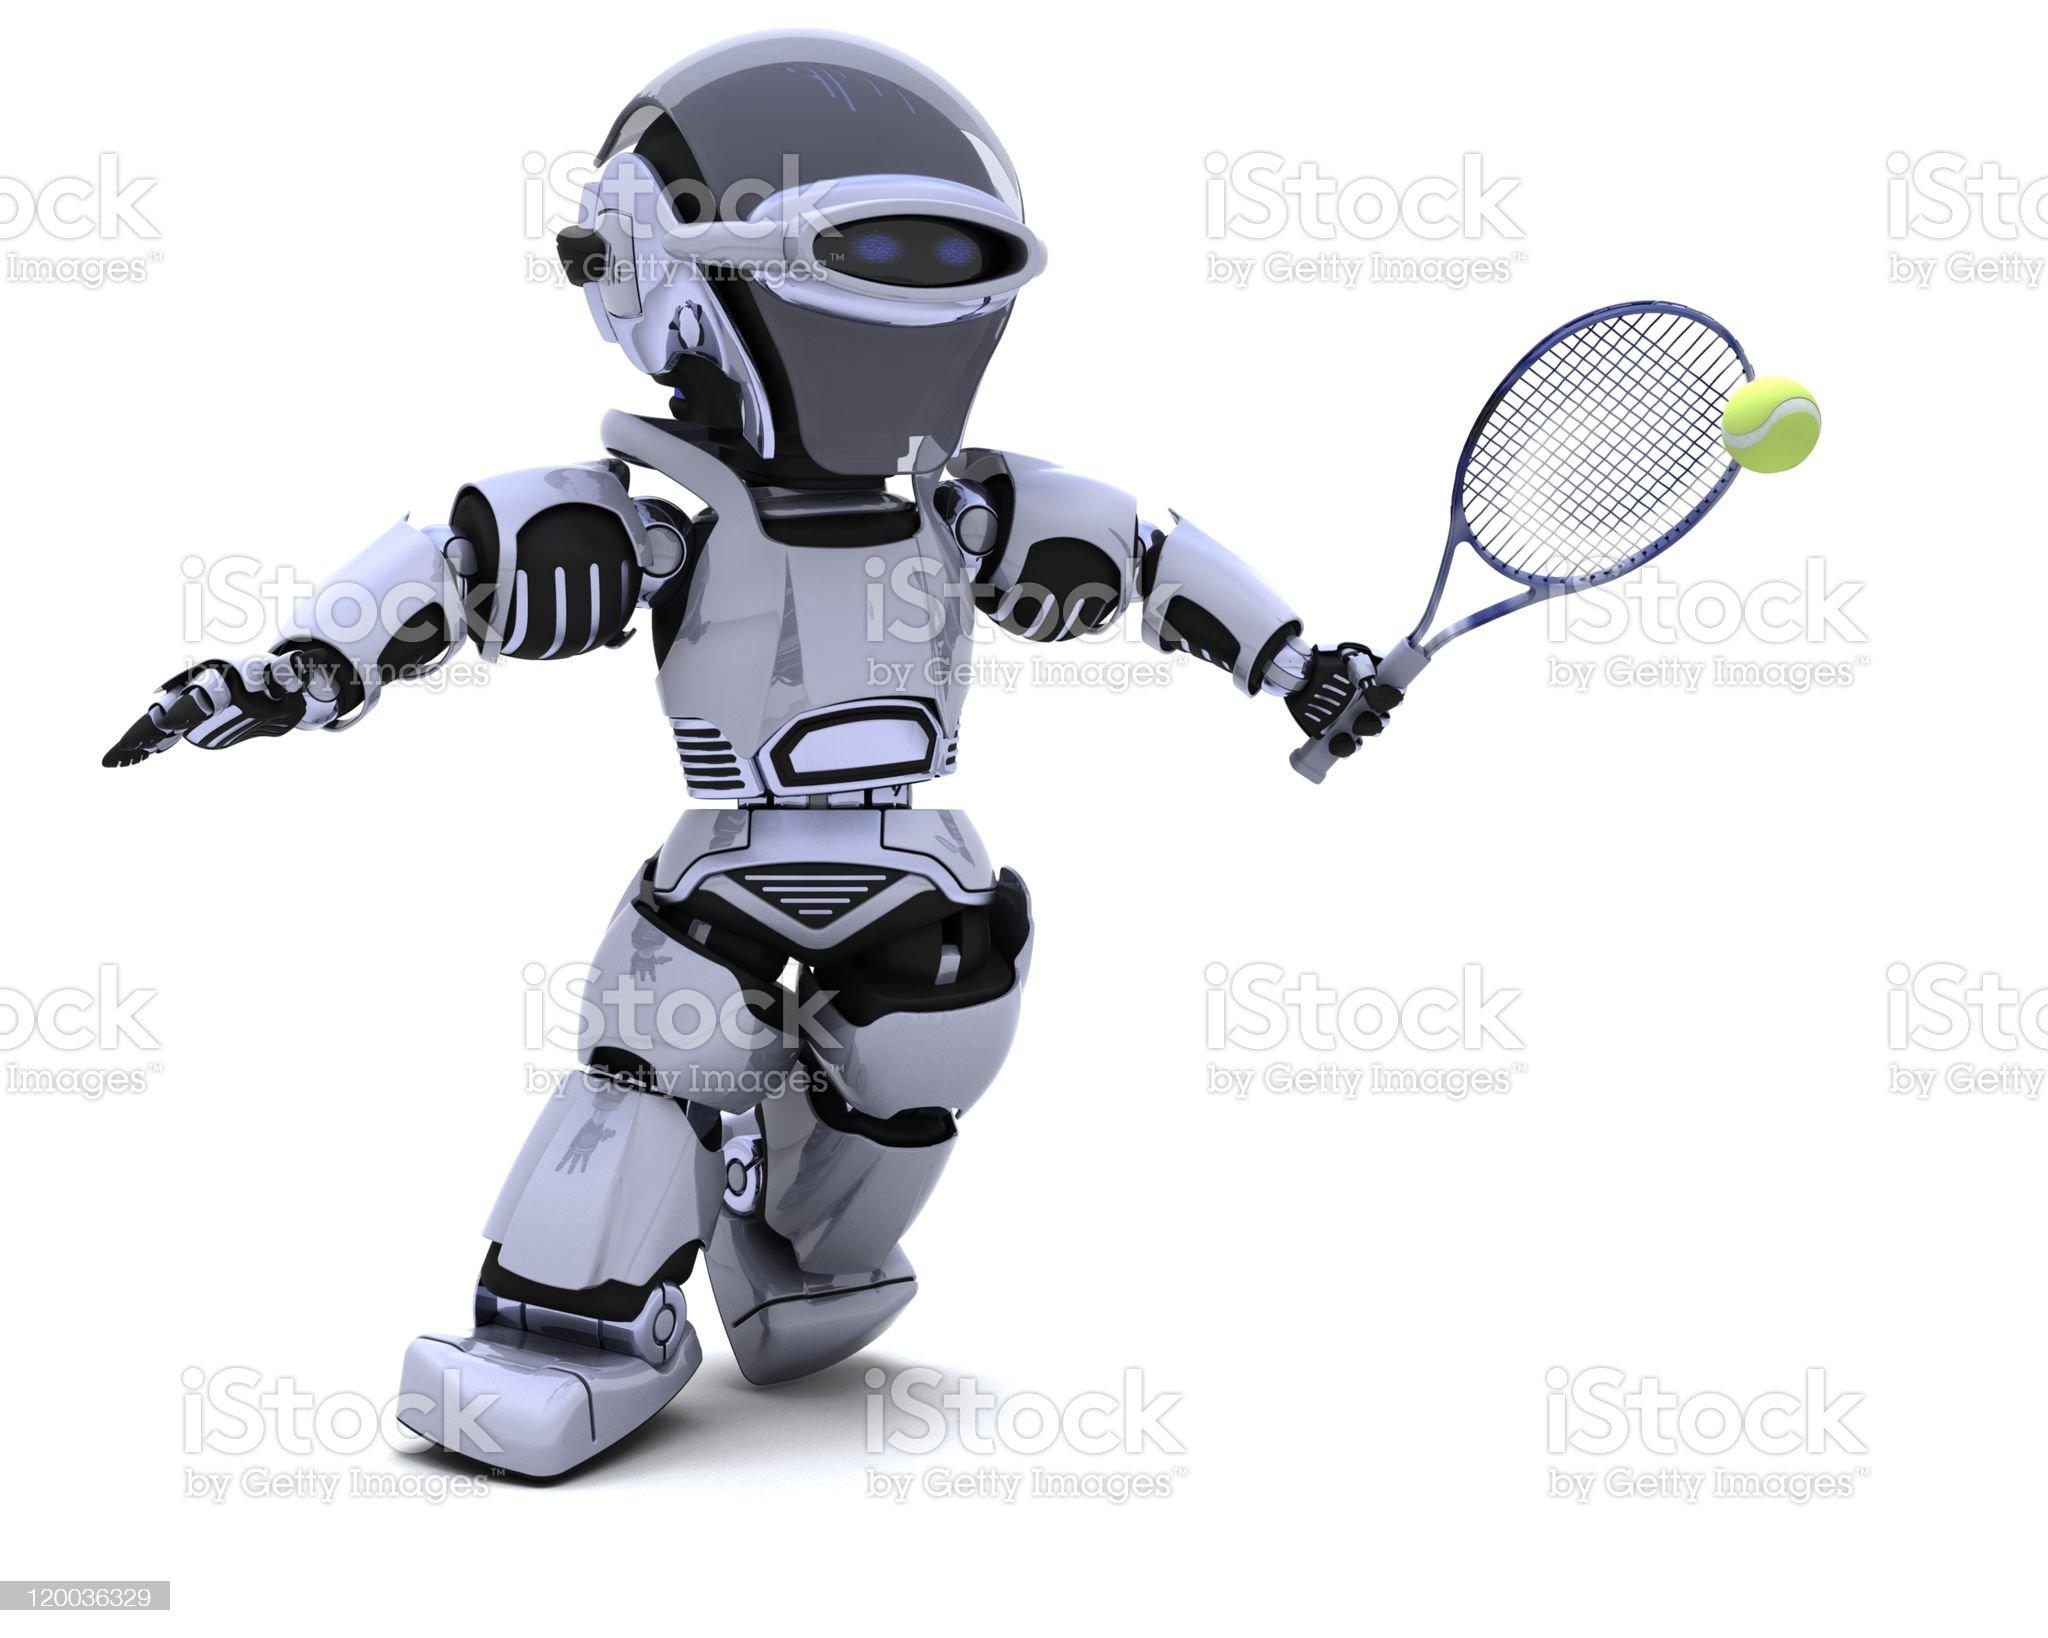 Robot playing tennis royalty-free stock vector art